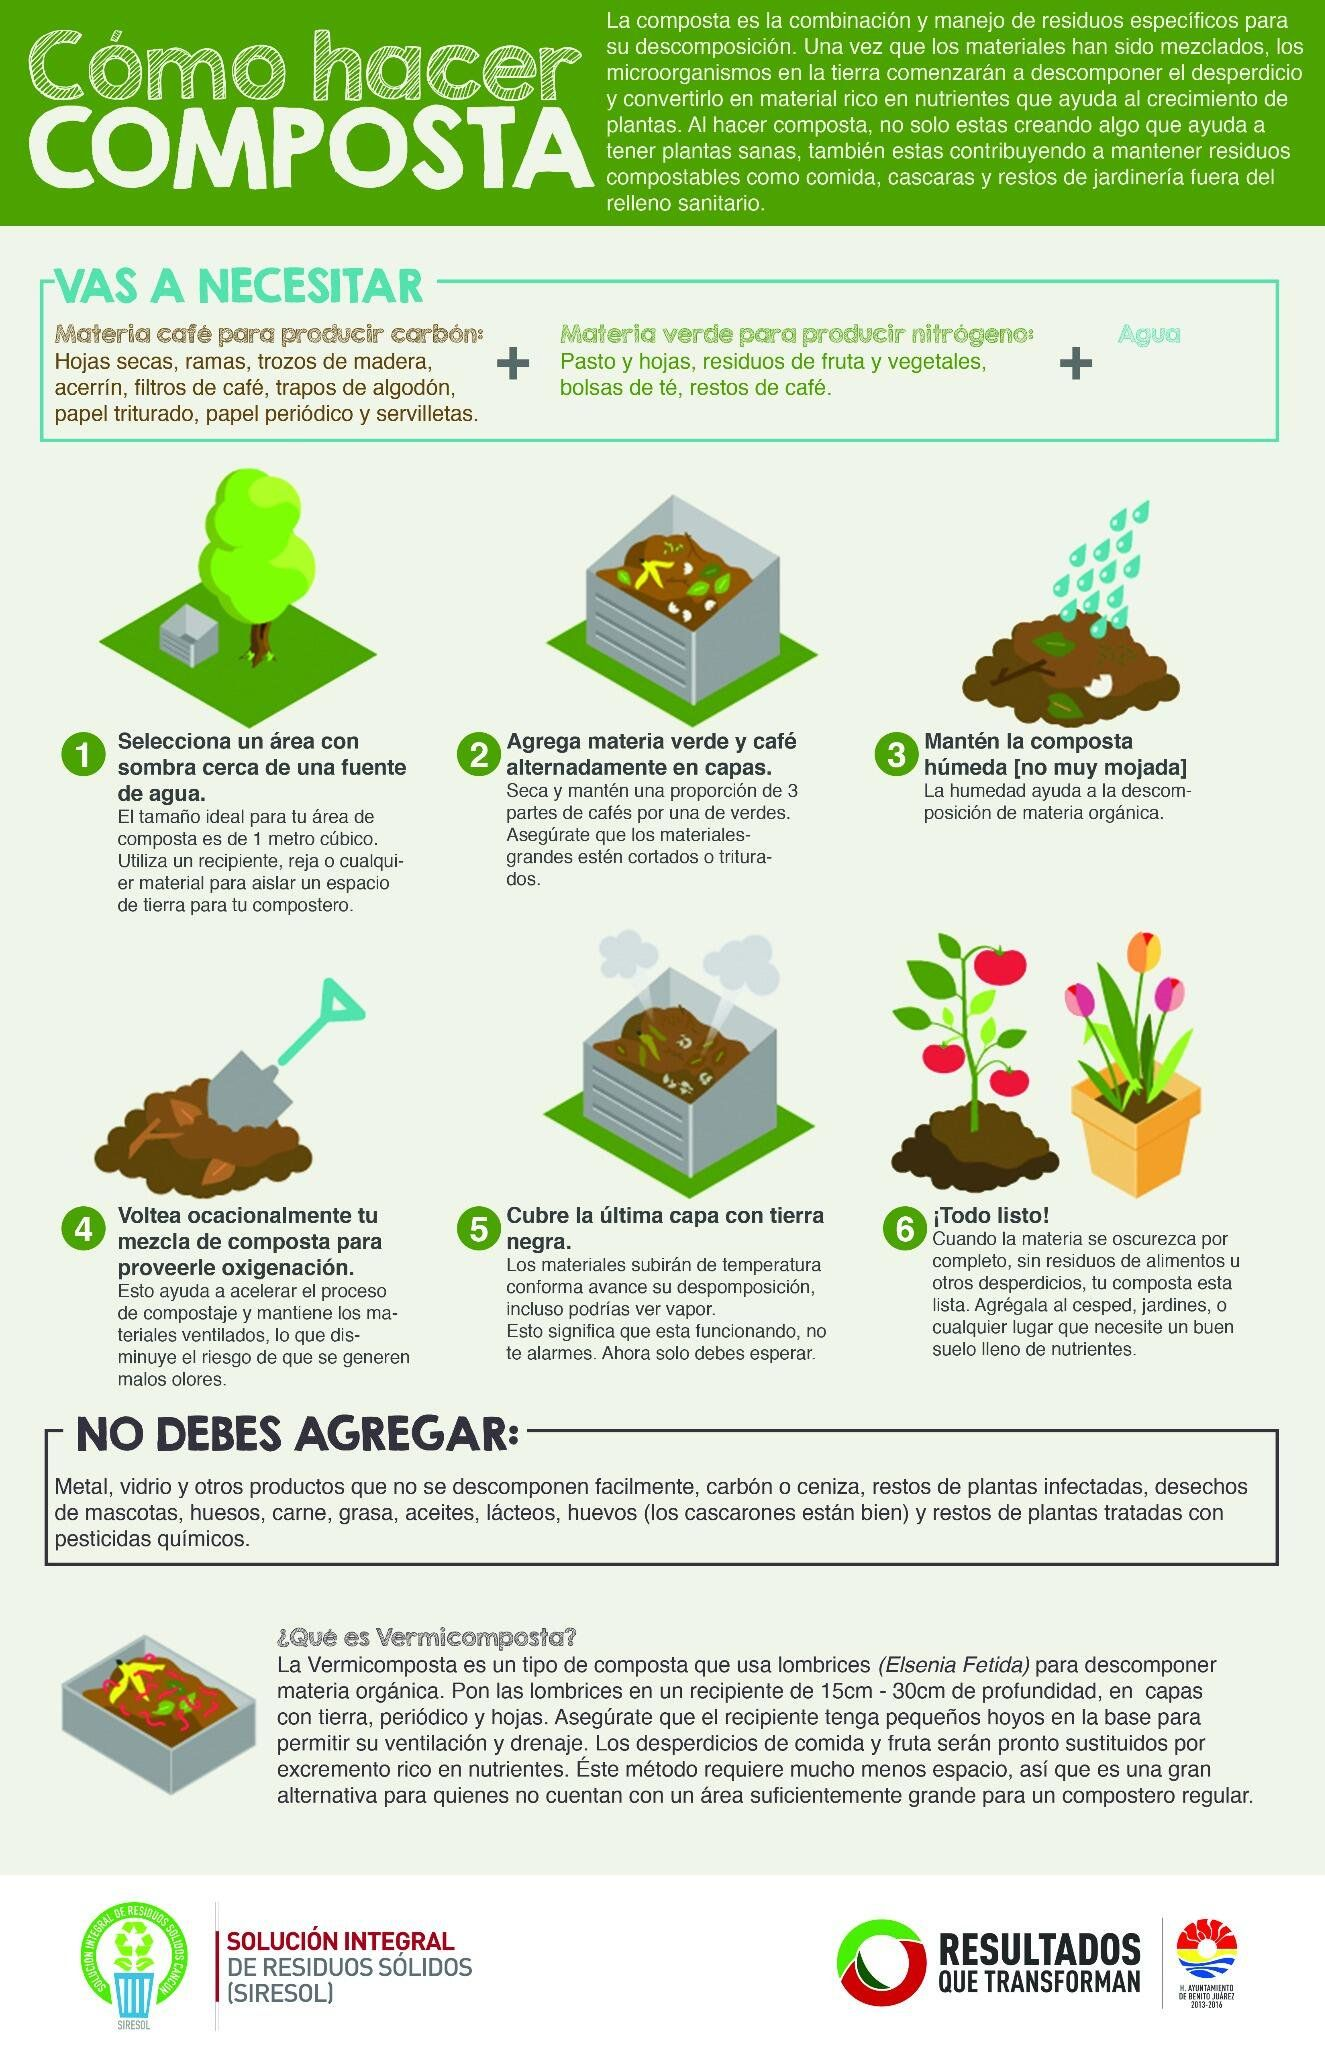 SIRESOL informa on Twitter Garden compost, Compost